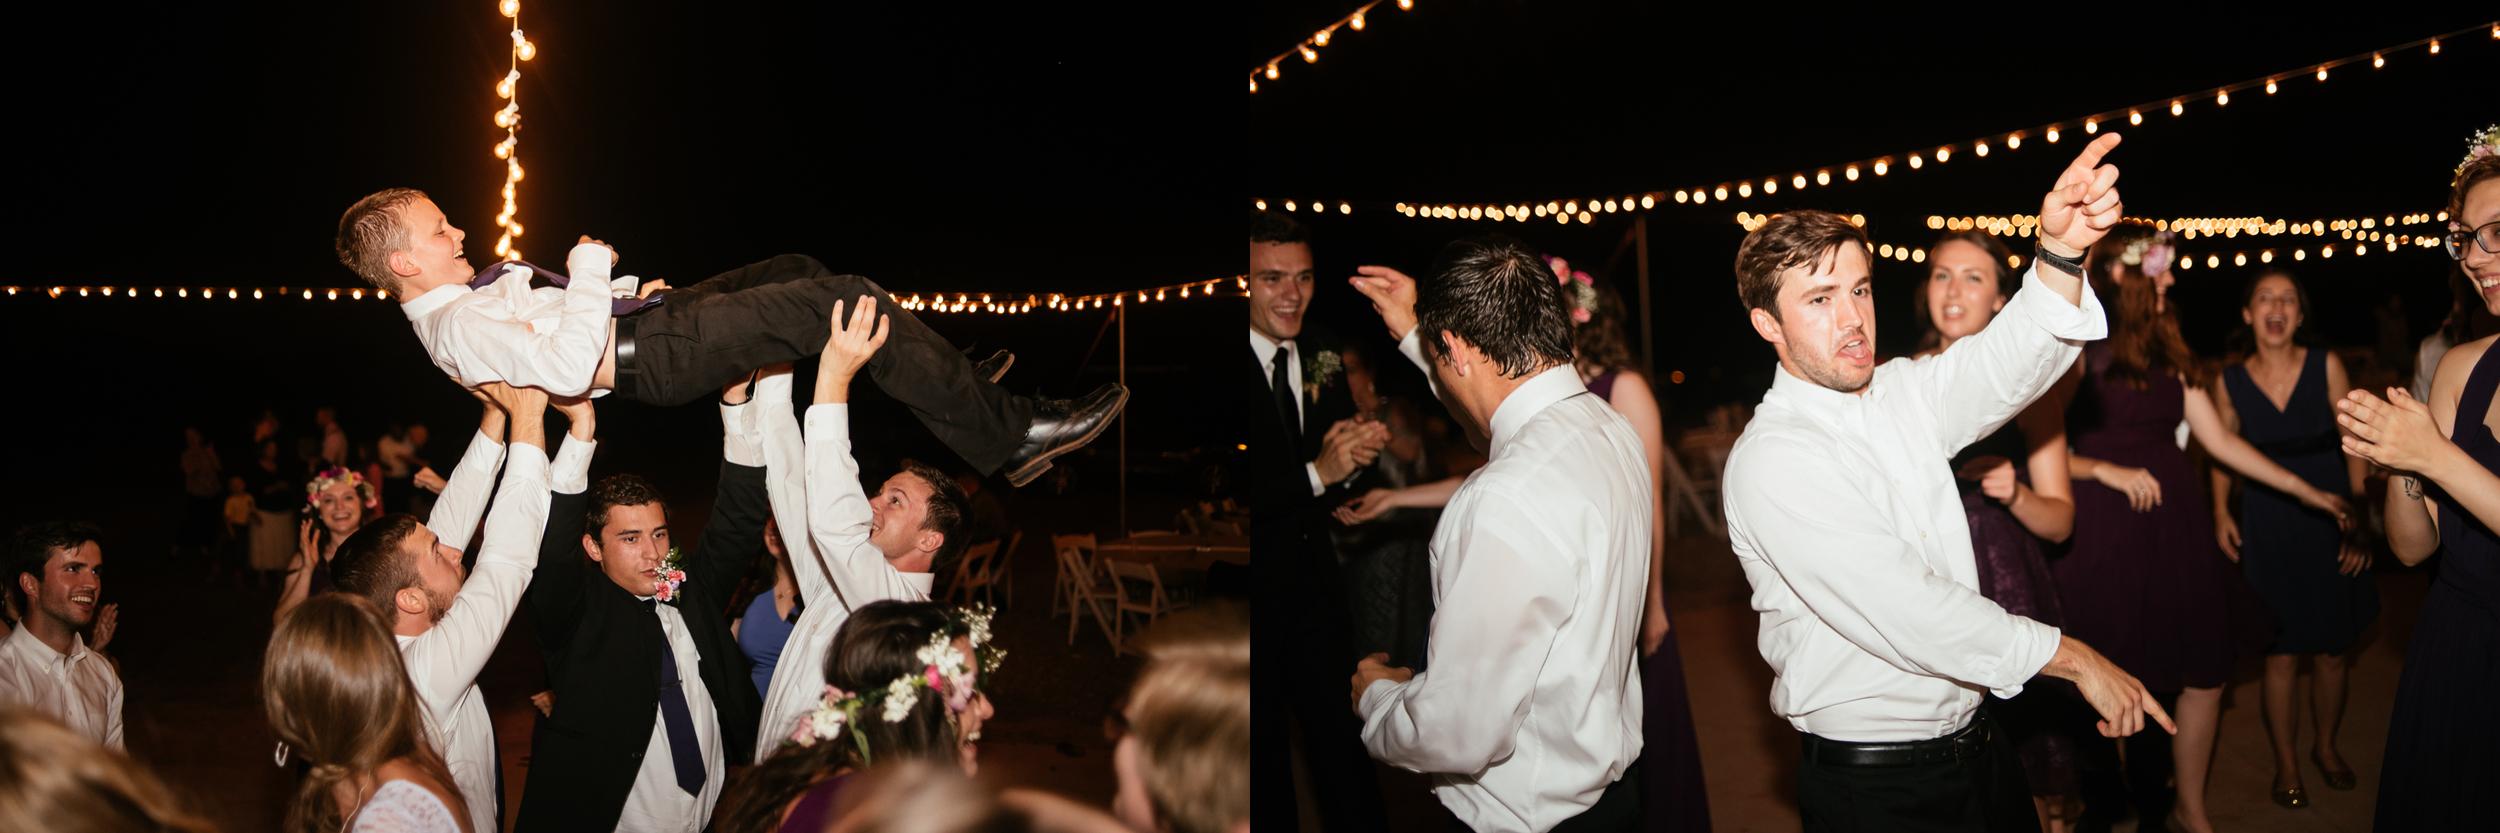 McCurrach Wedding19.jpg